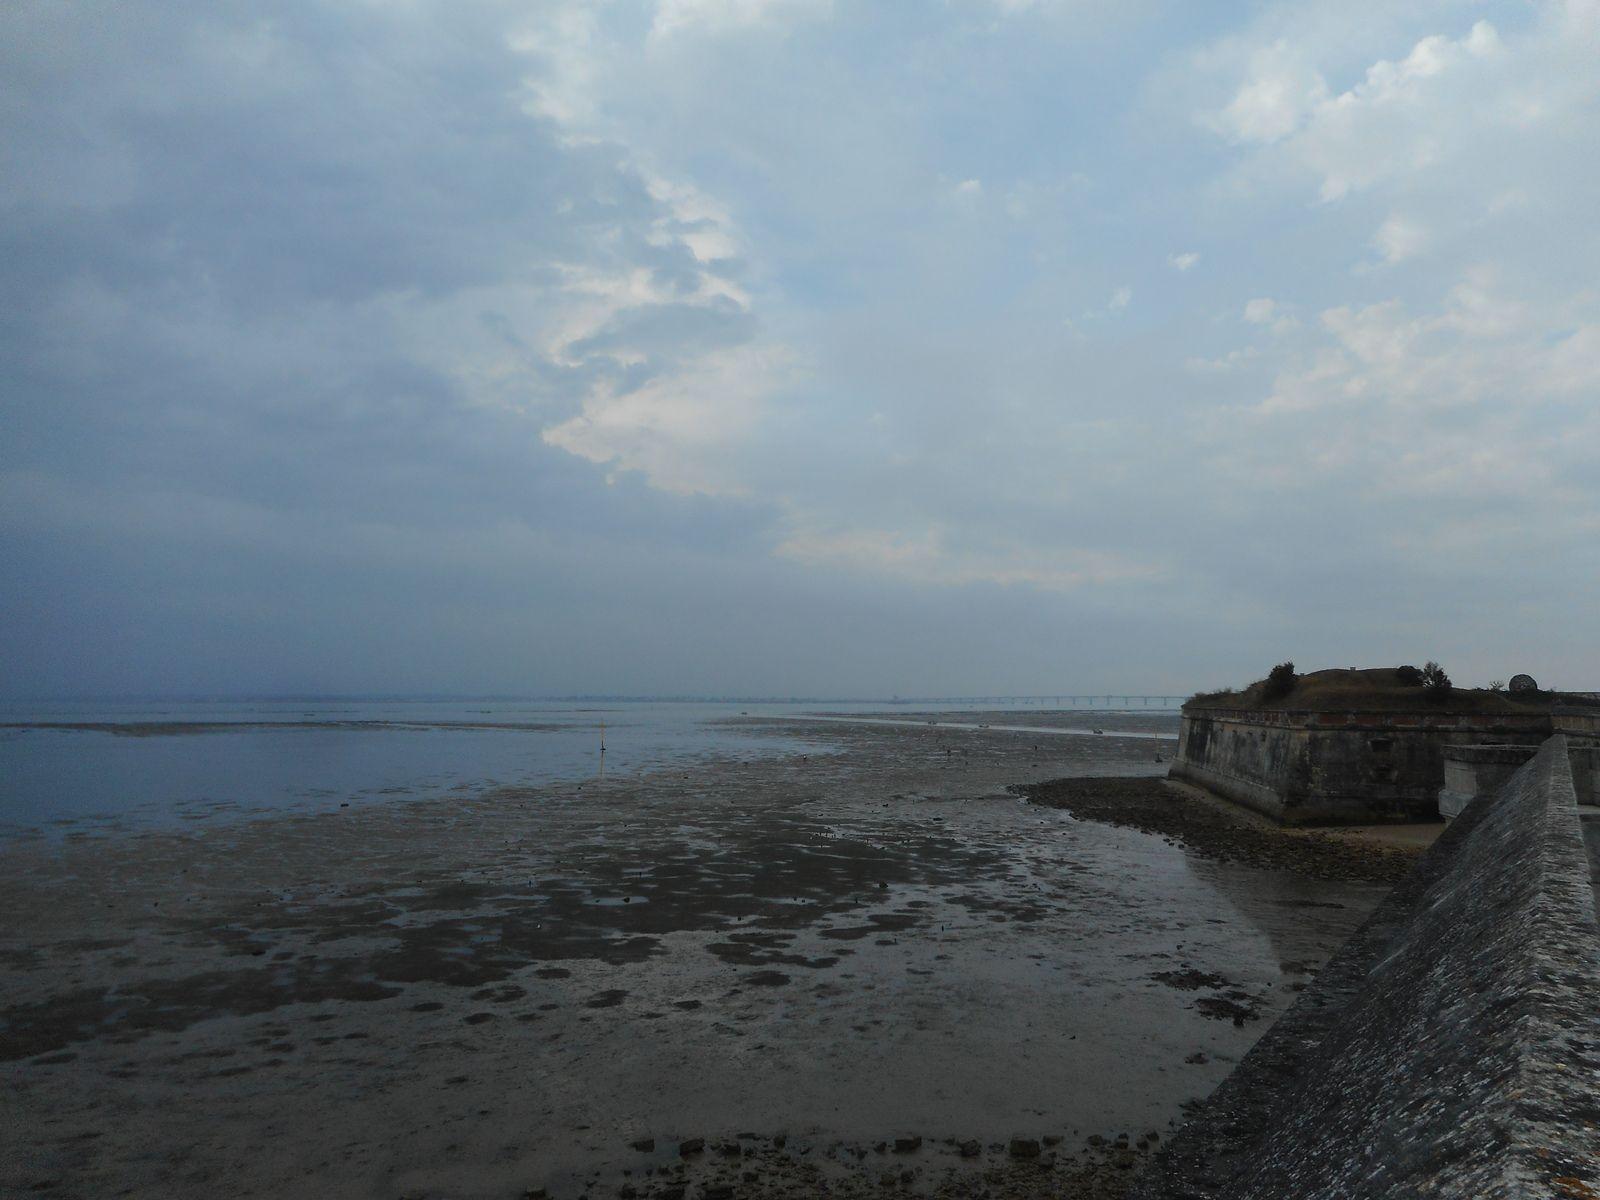 L'Ile d'Oléron